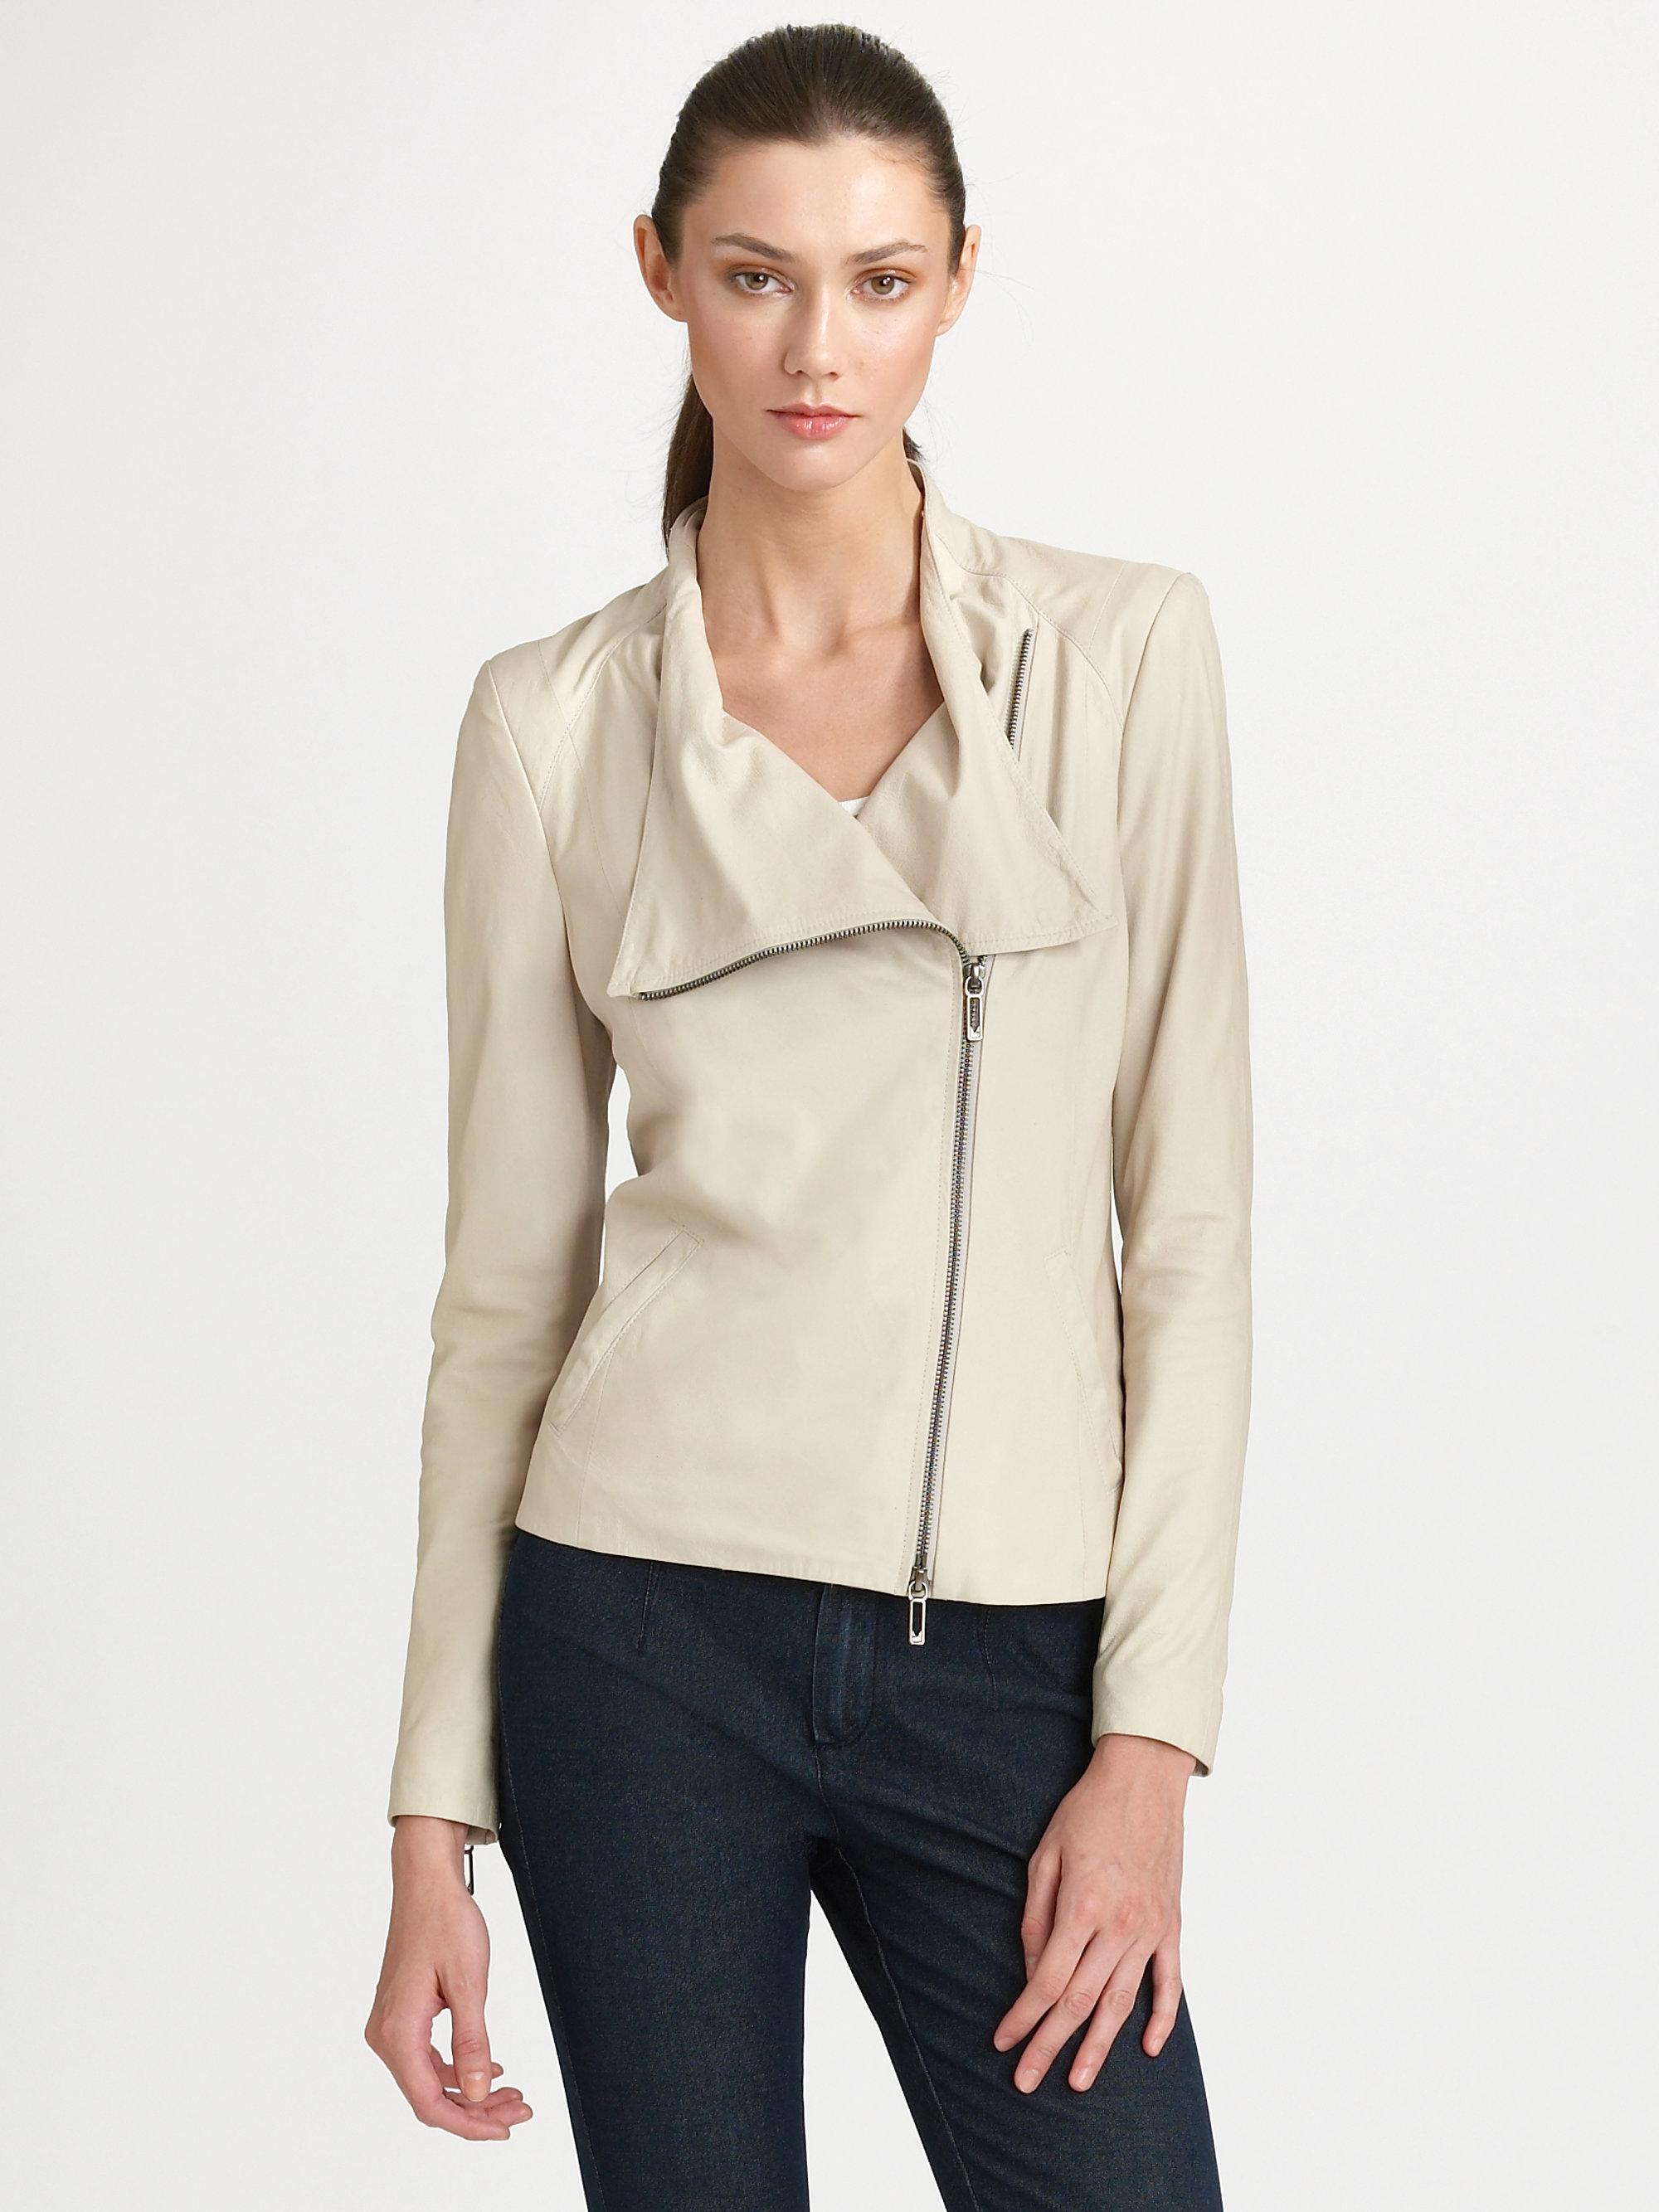 Vince paper leather jacket